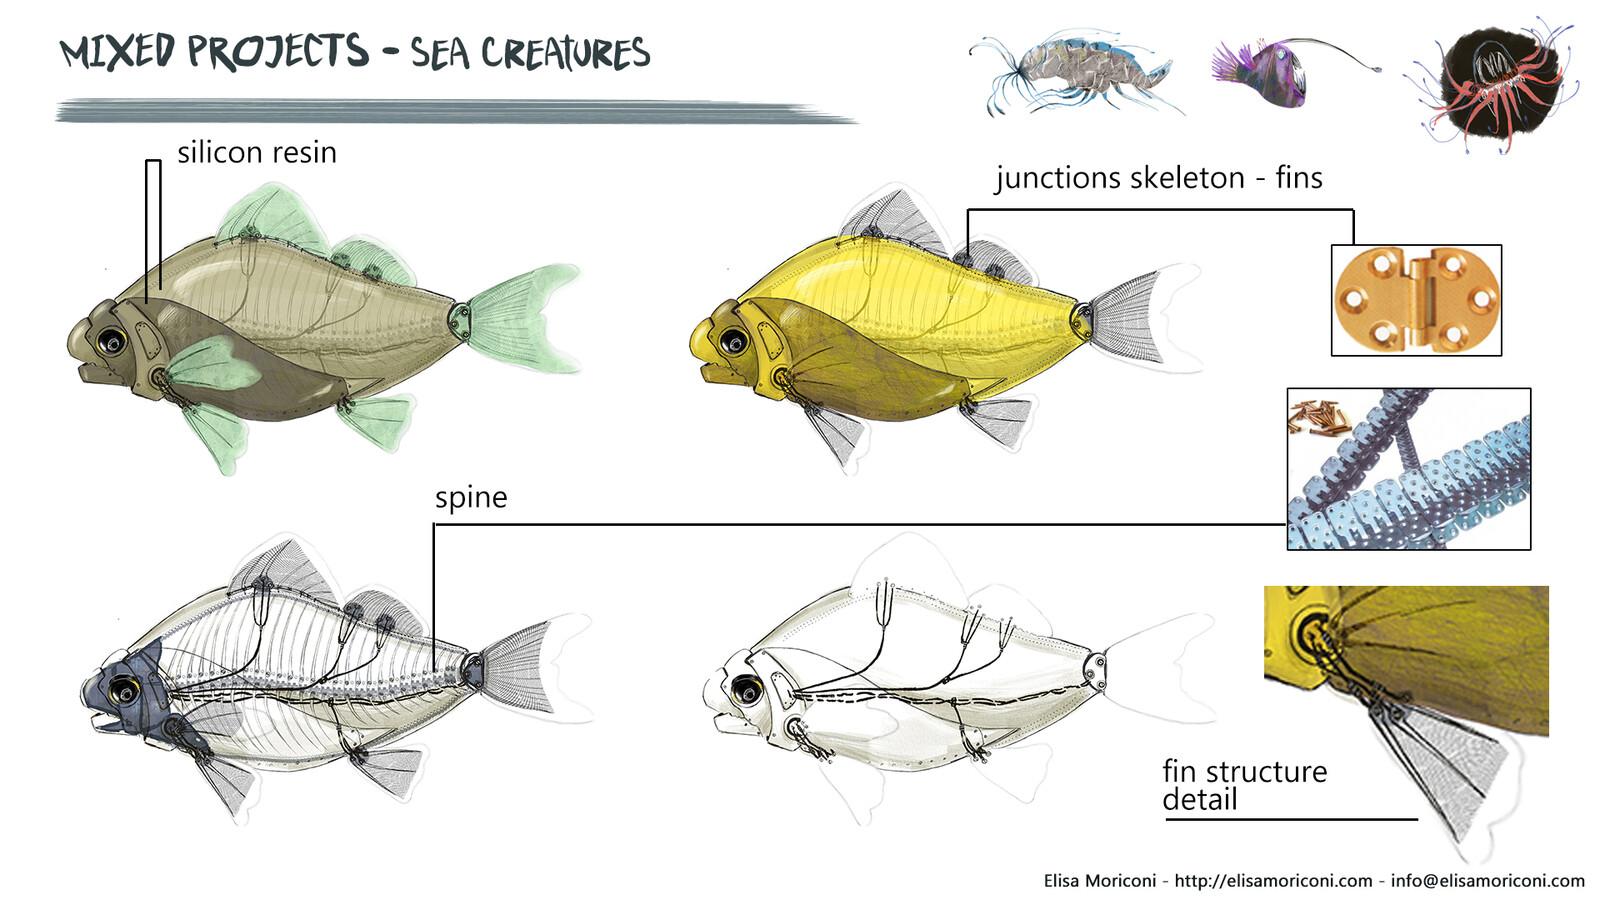 The mechanical fish